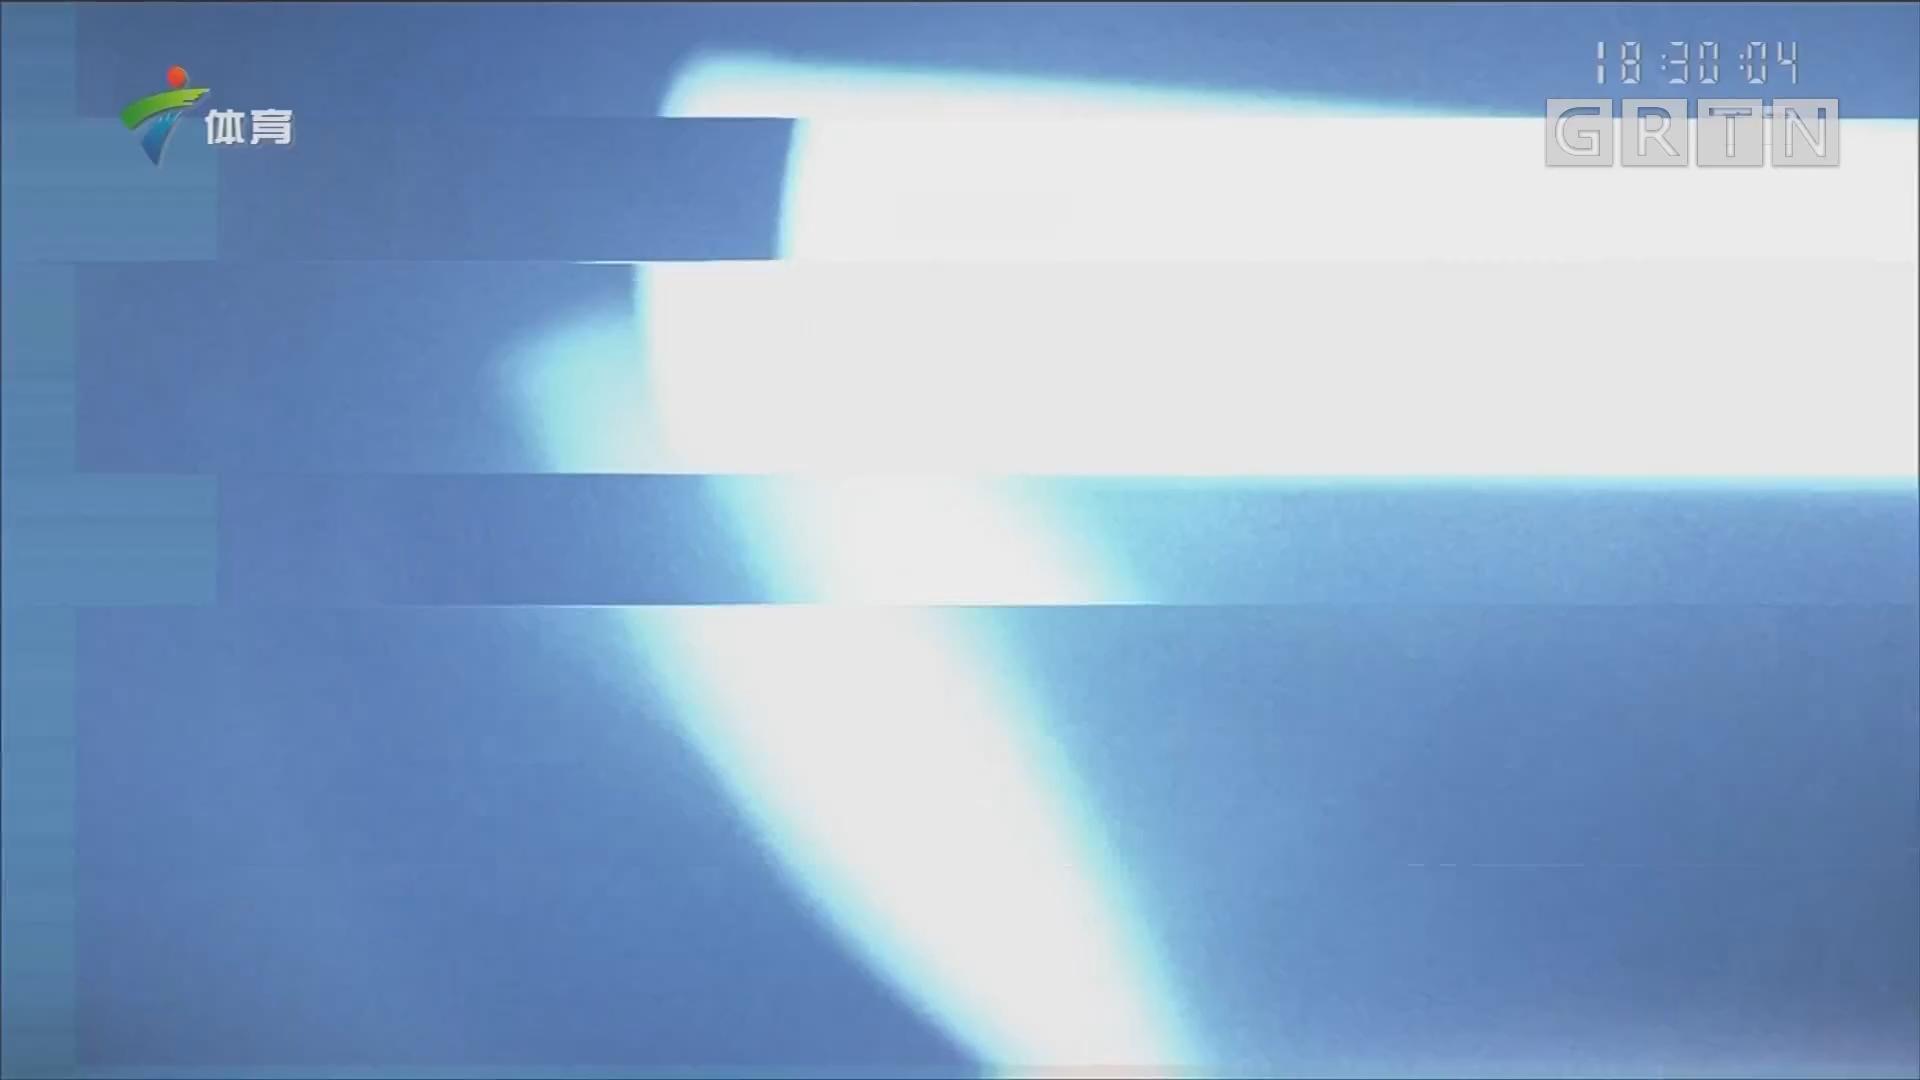 [HD][2019-06-27]体育世界:2020年东京奥运会将保留拳击项目